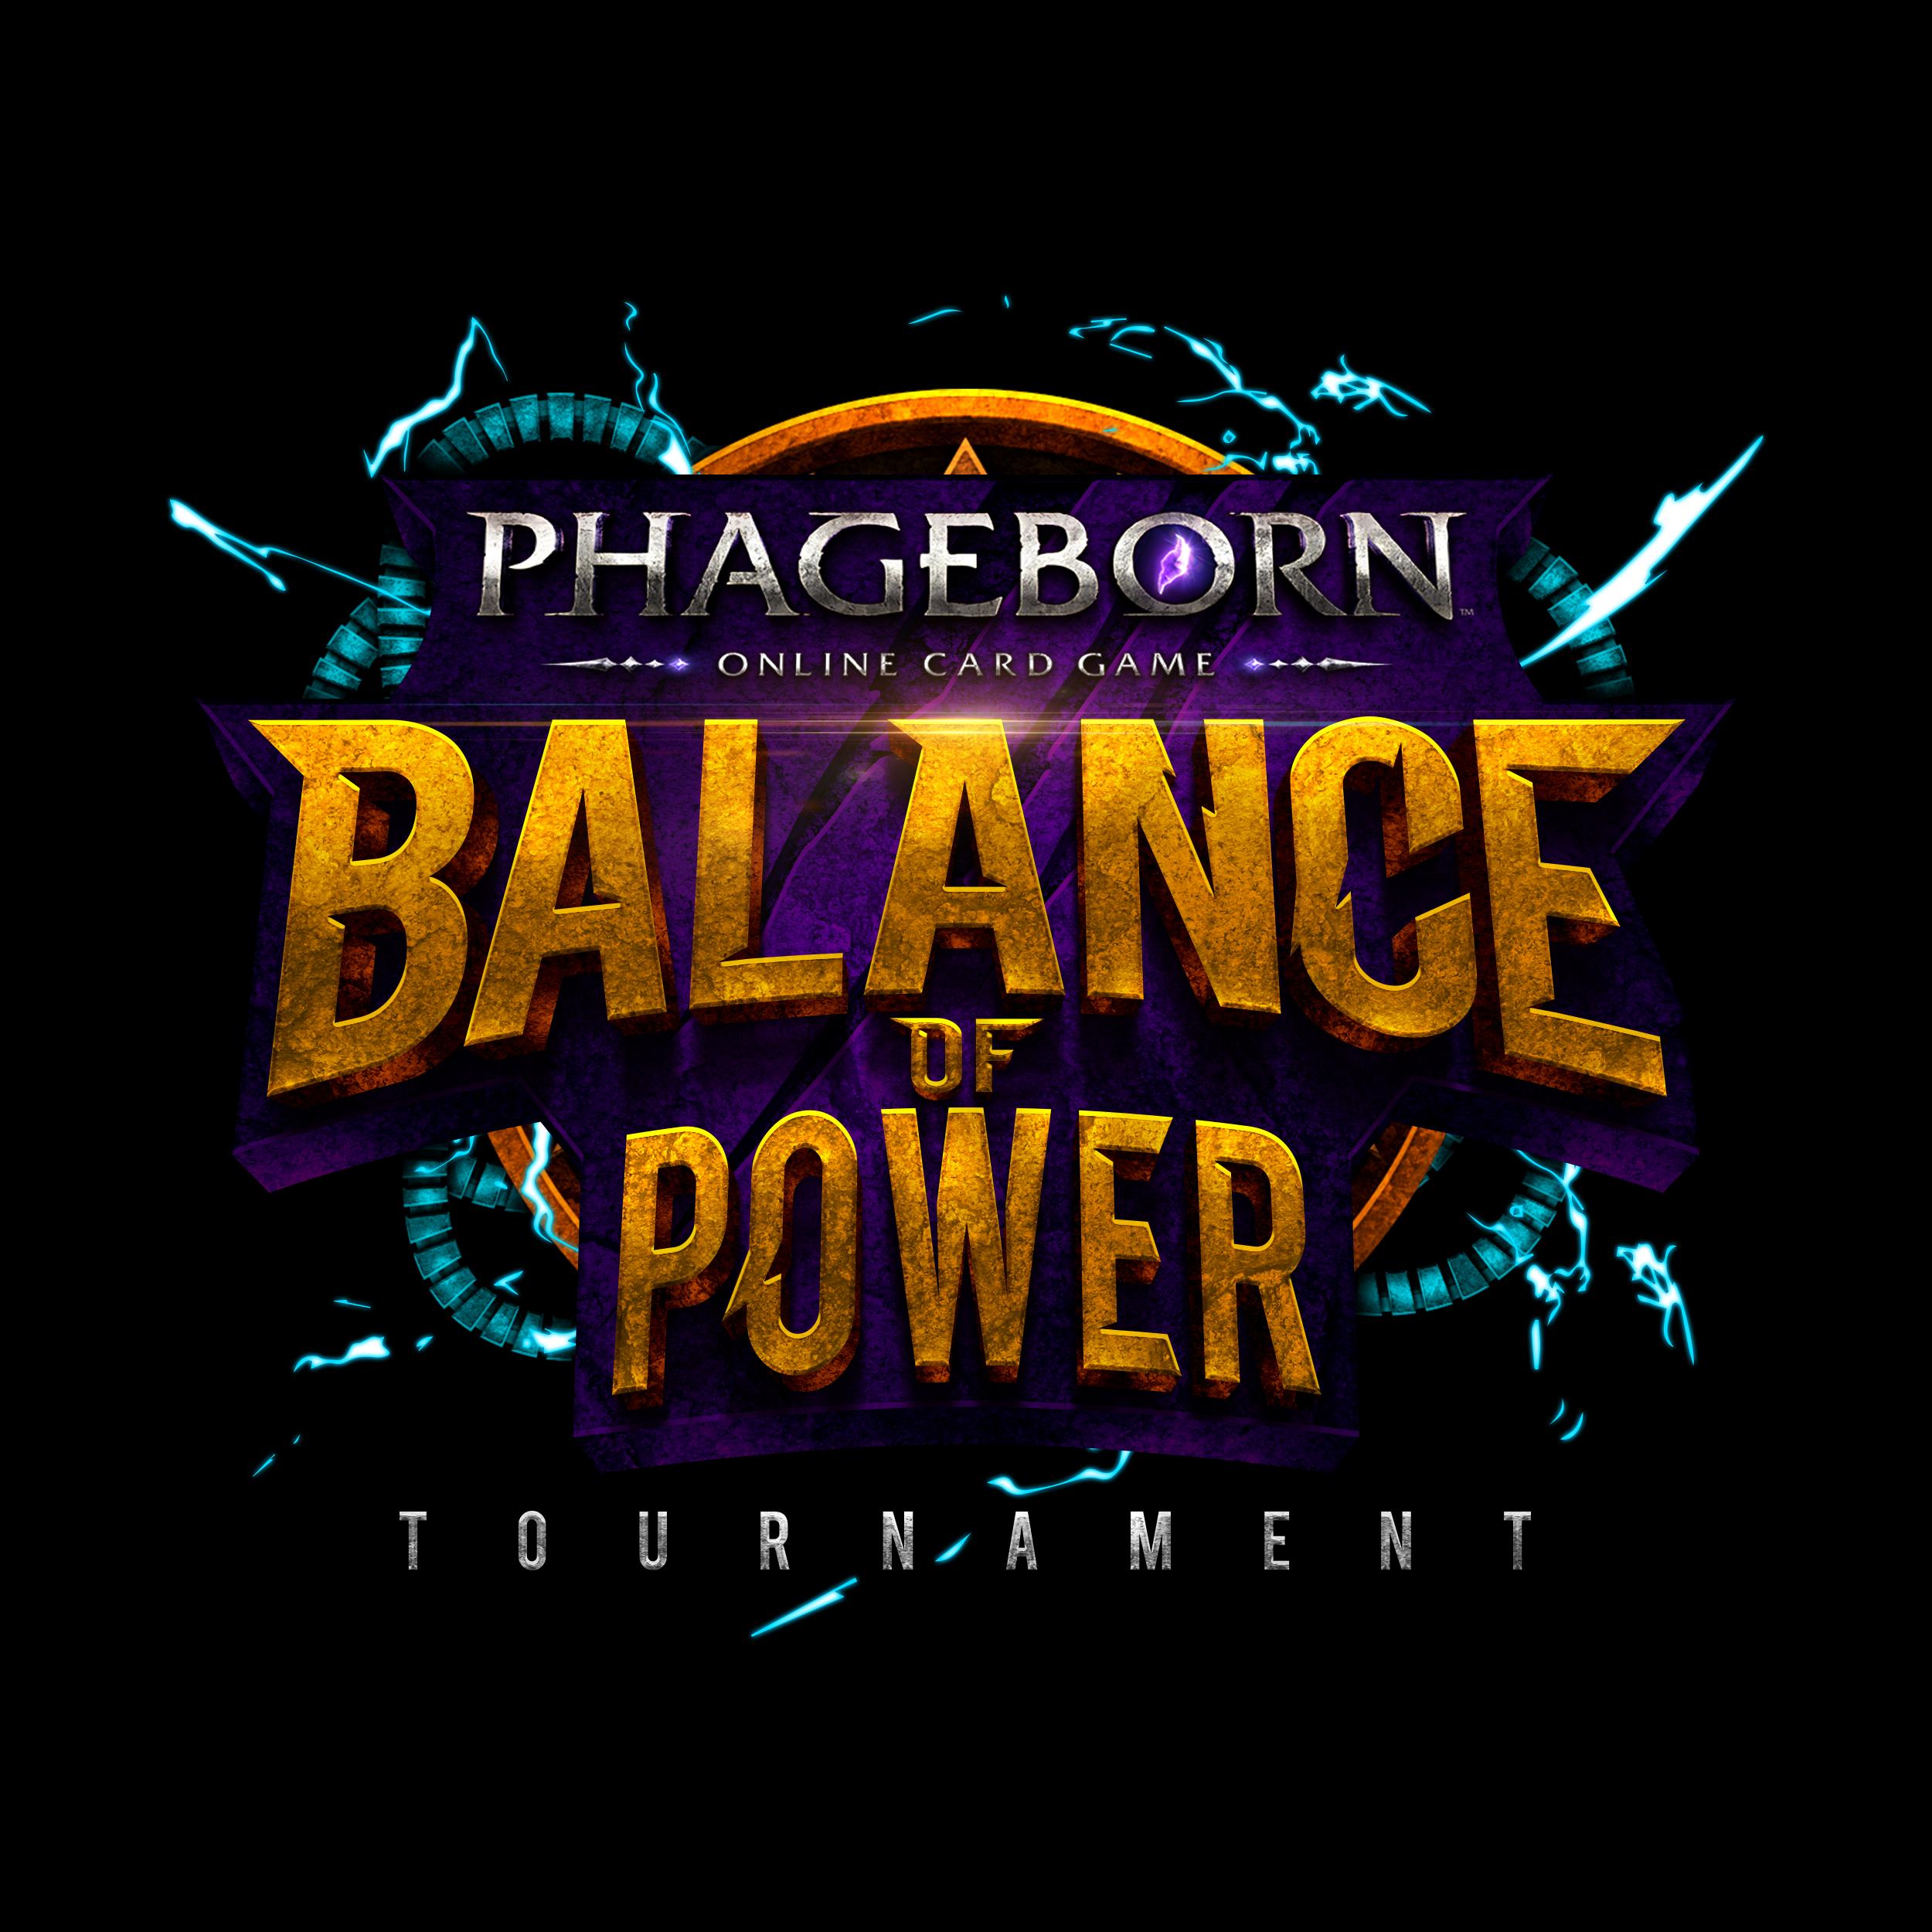 PHAGEBORN ONLINE CARD GAME - TOURNAMENT LOGO